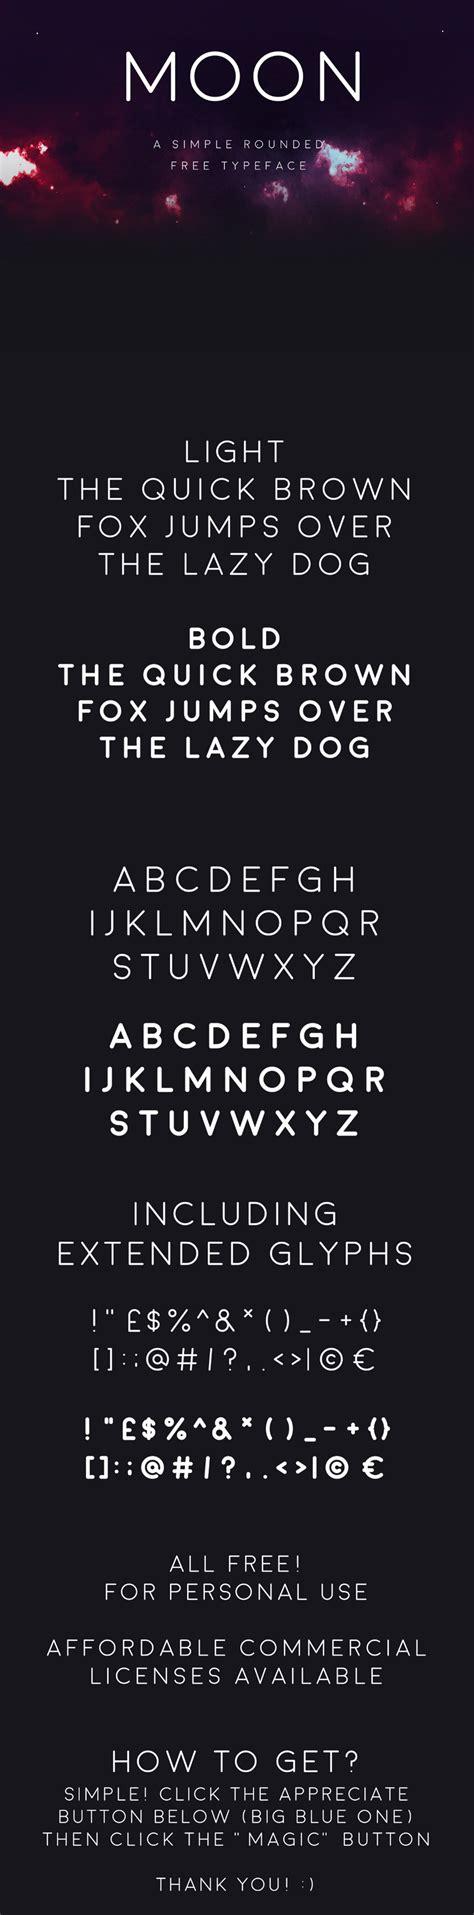 Free Moon Font